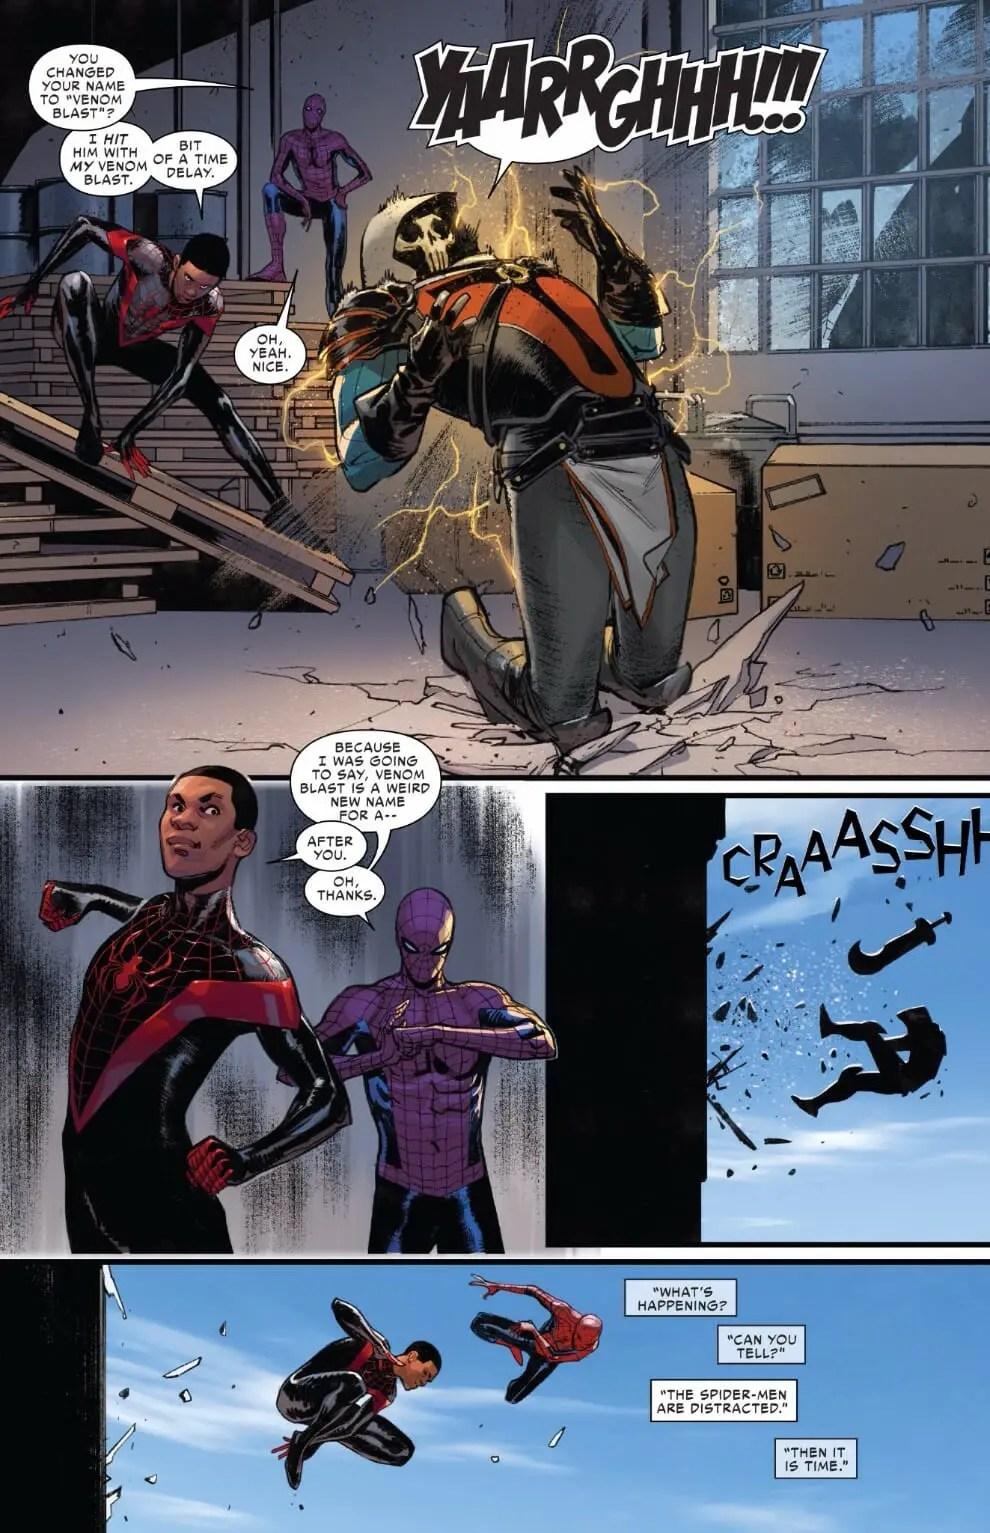 Spider-Men II 5-3 - Comic Book Revolution